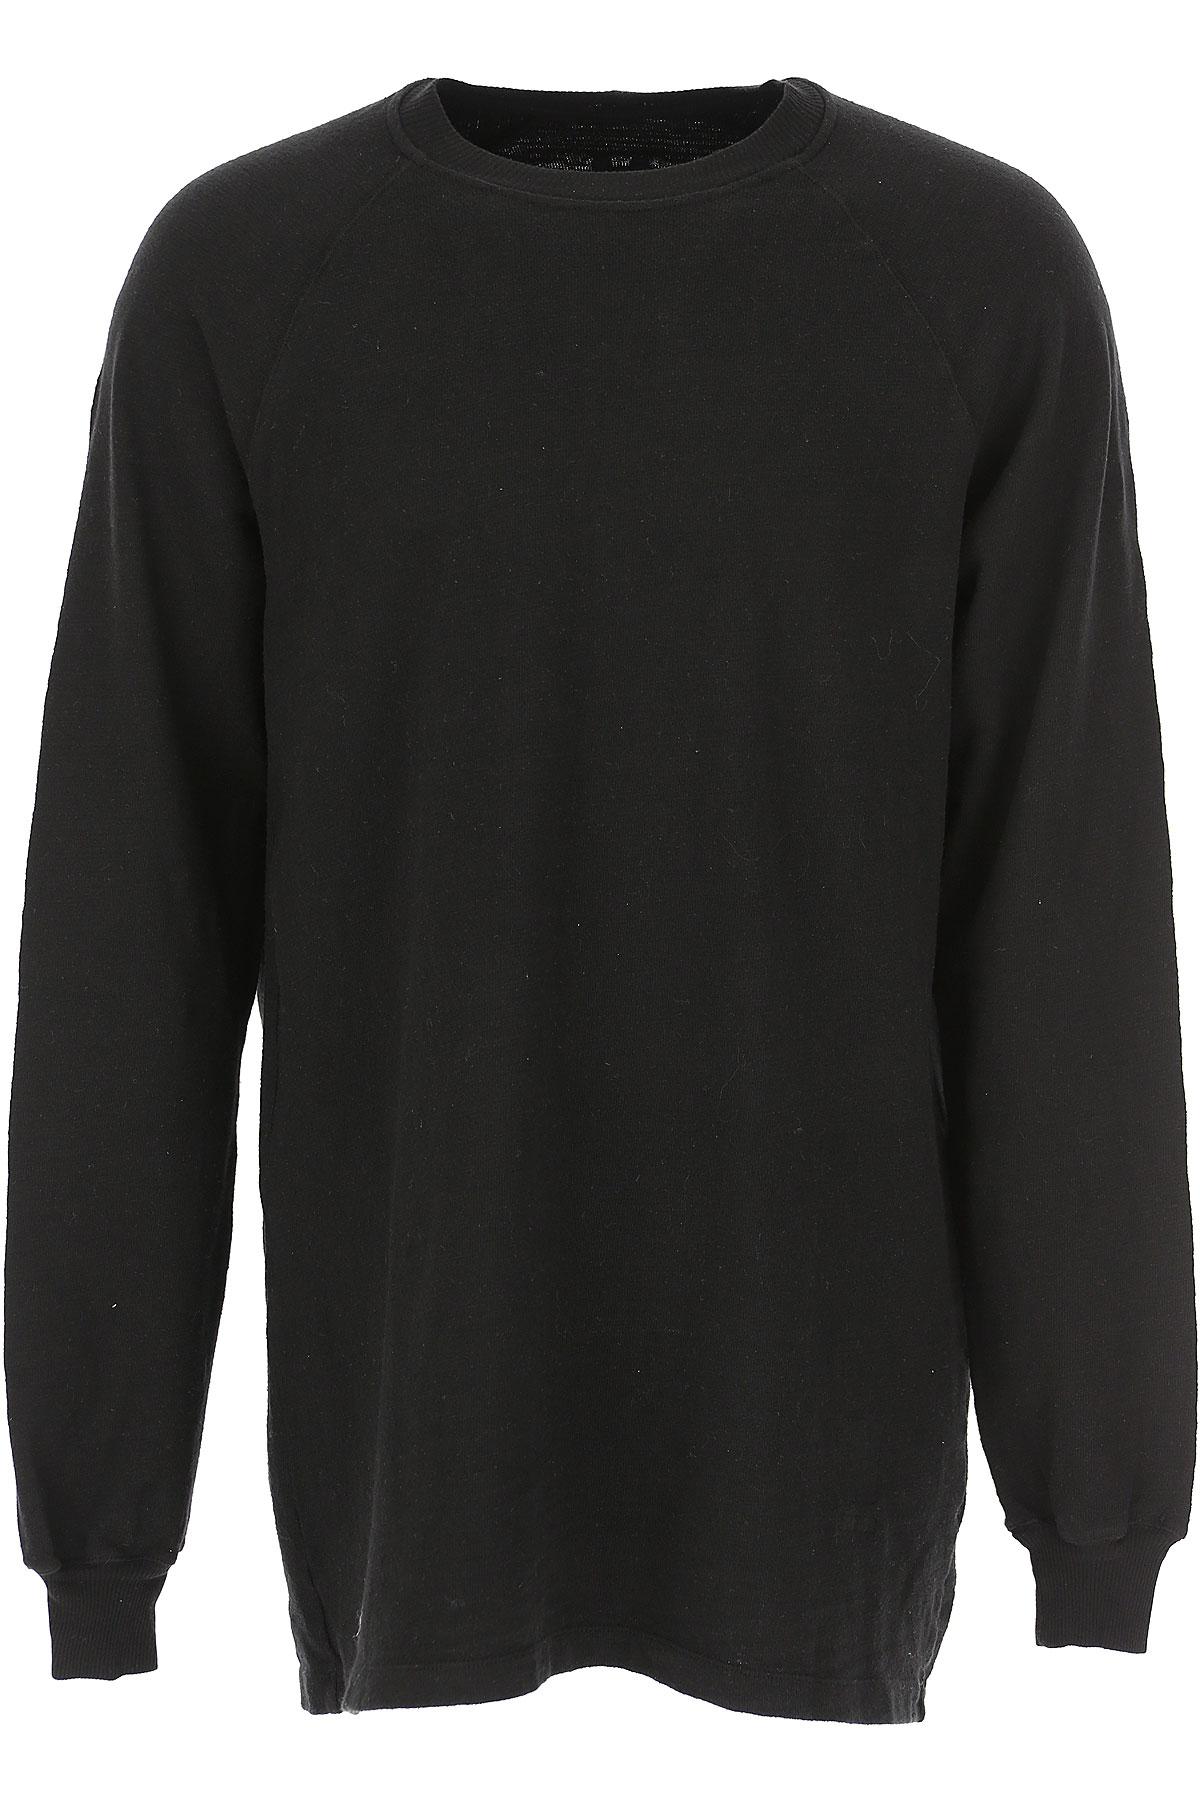 Rick Owens DRKSHDW Mens Clothing On Sale in Outlet, Black, Cotton, 2019, L M